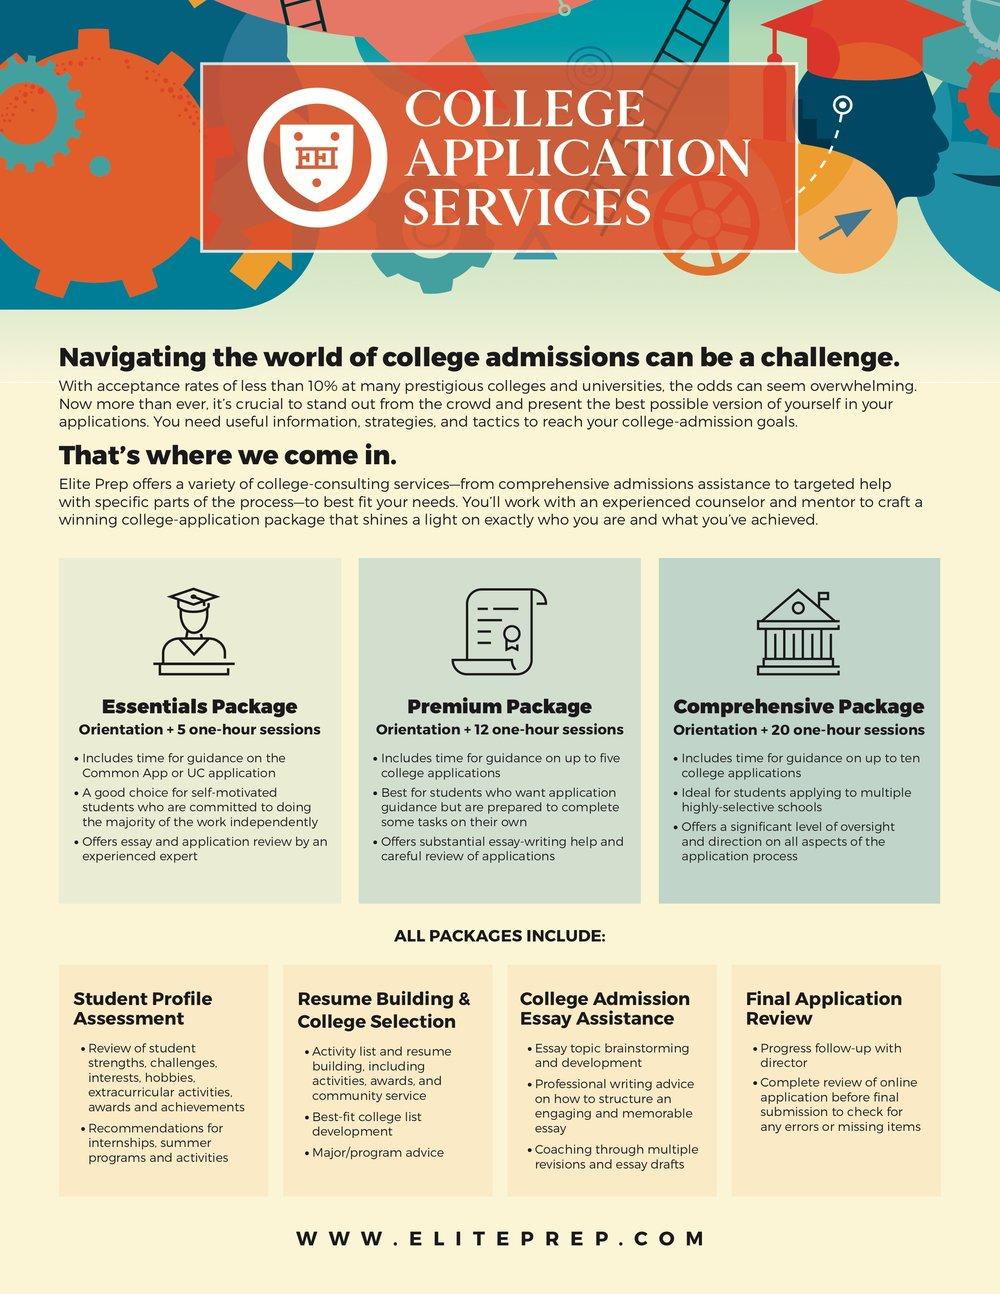 College Application Services Flyer 2018 E2.jpg